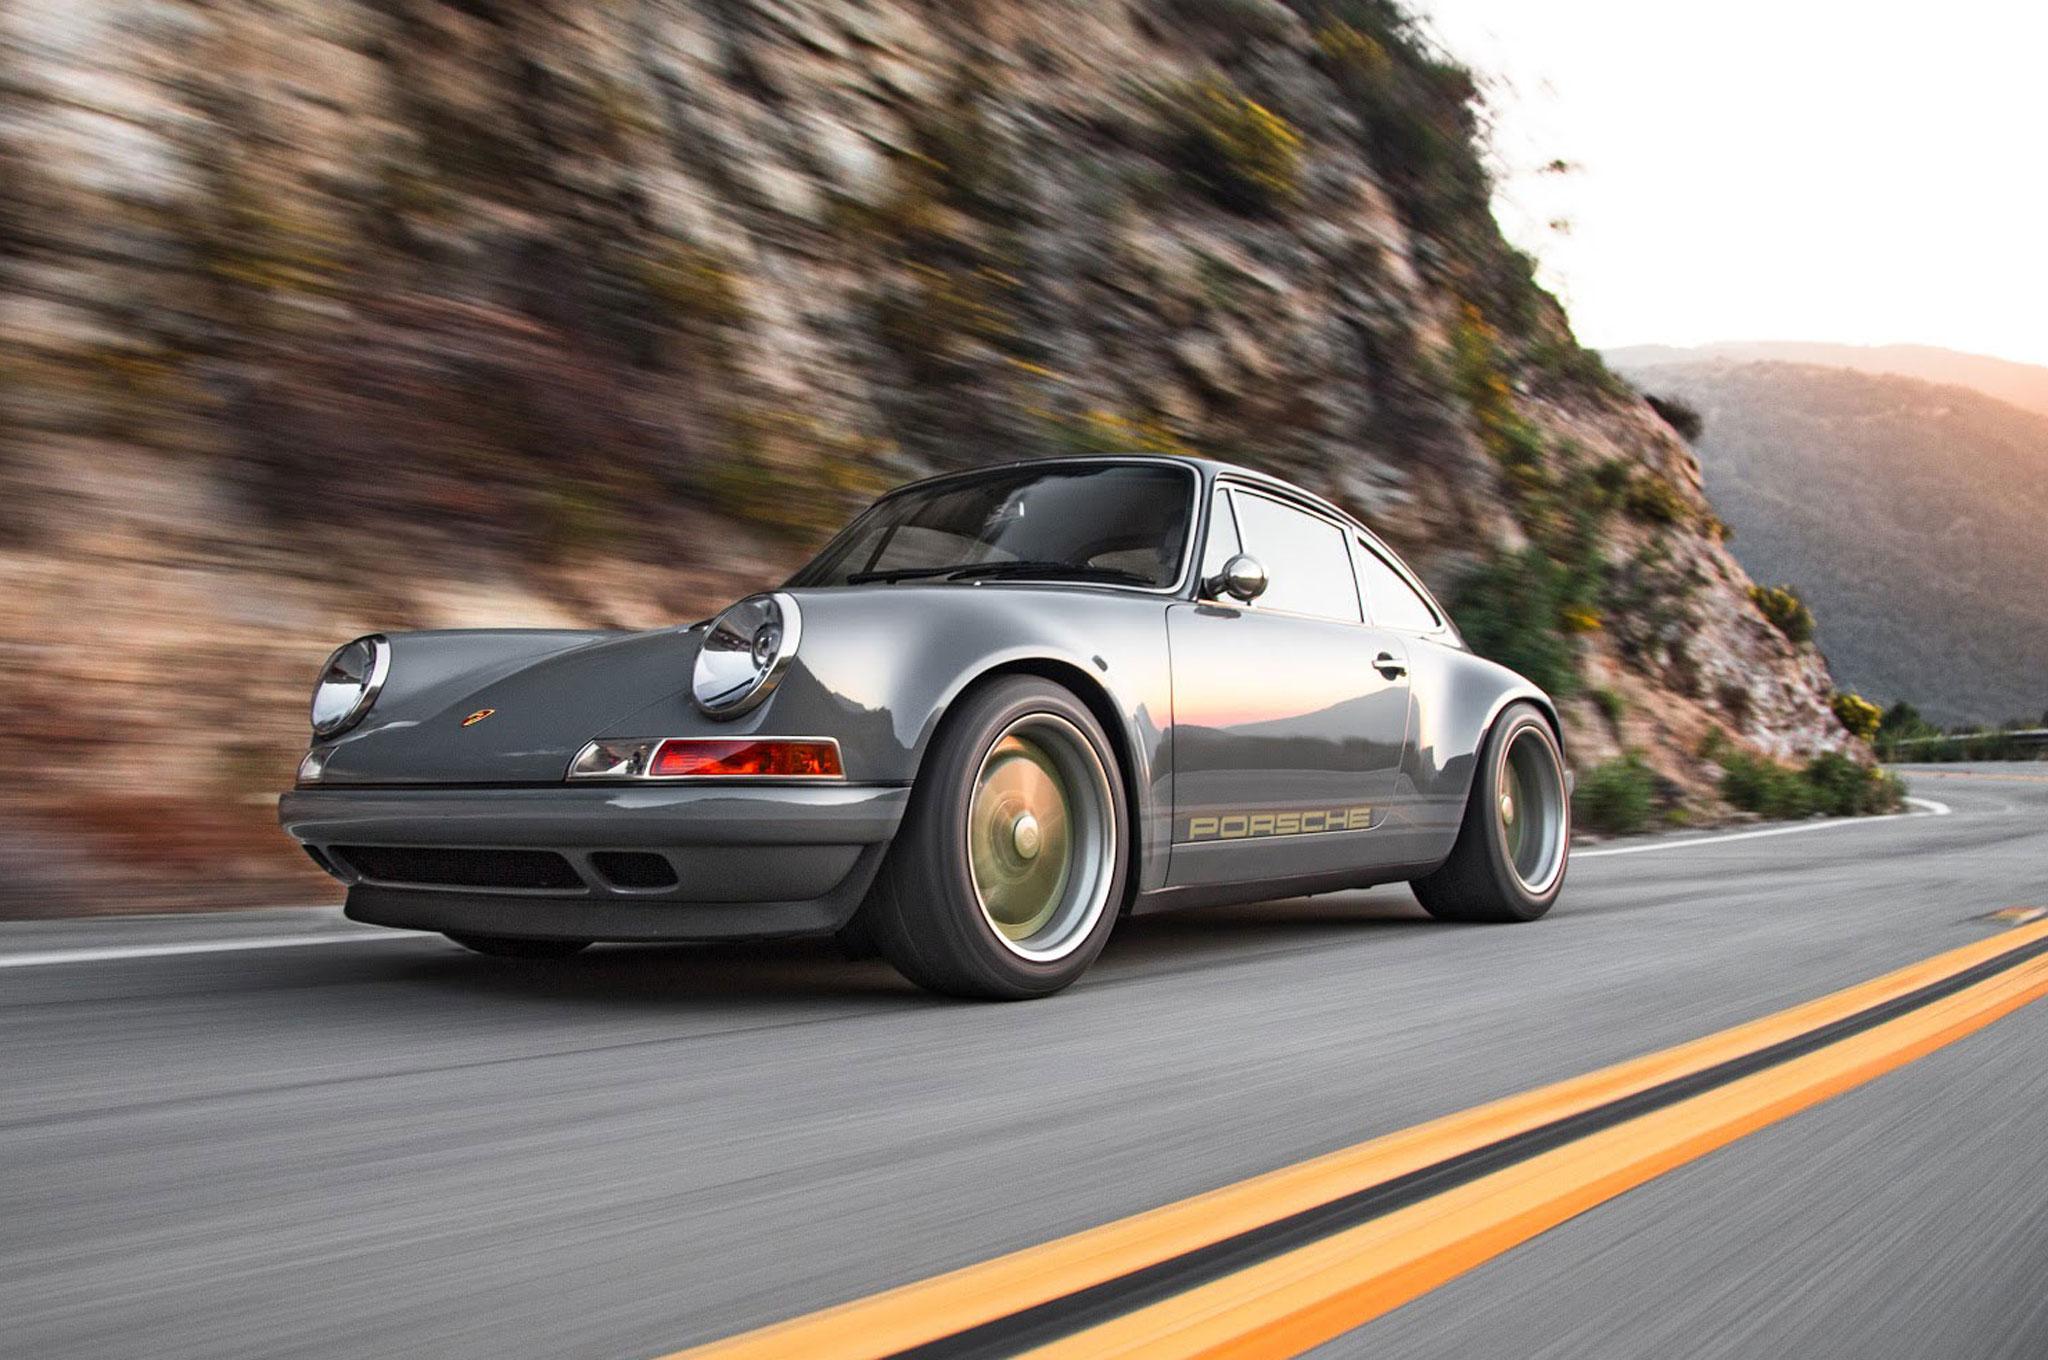 Singer Porsche Lead 01